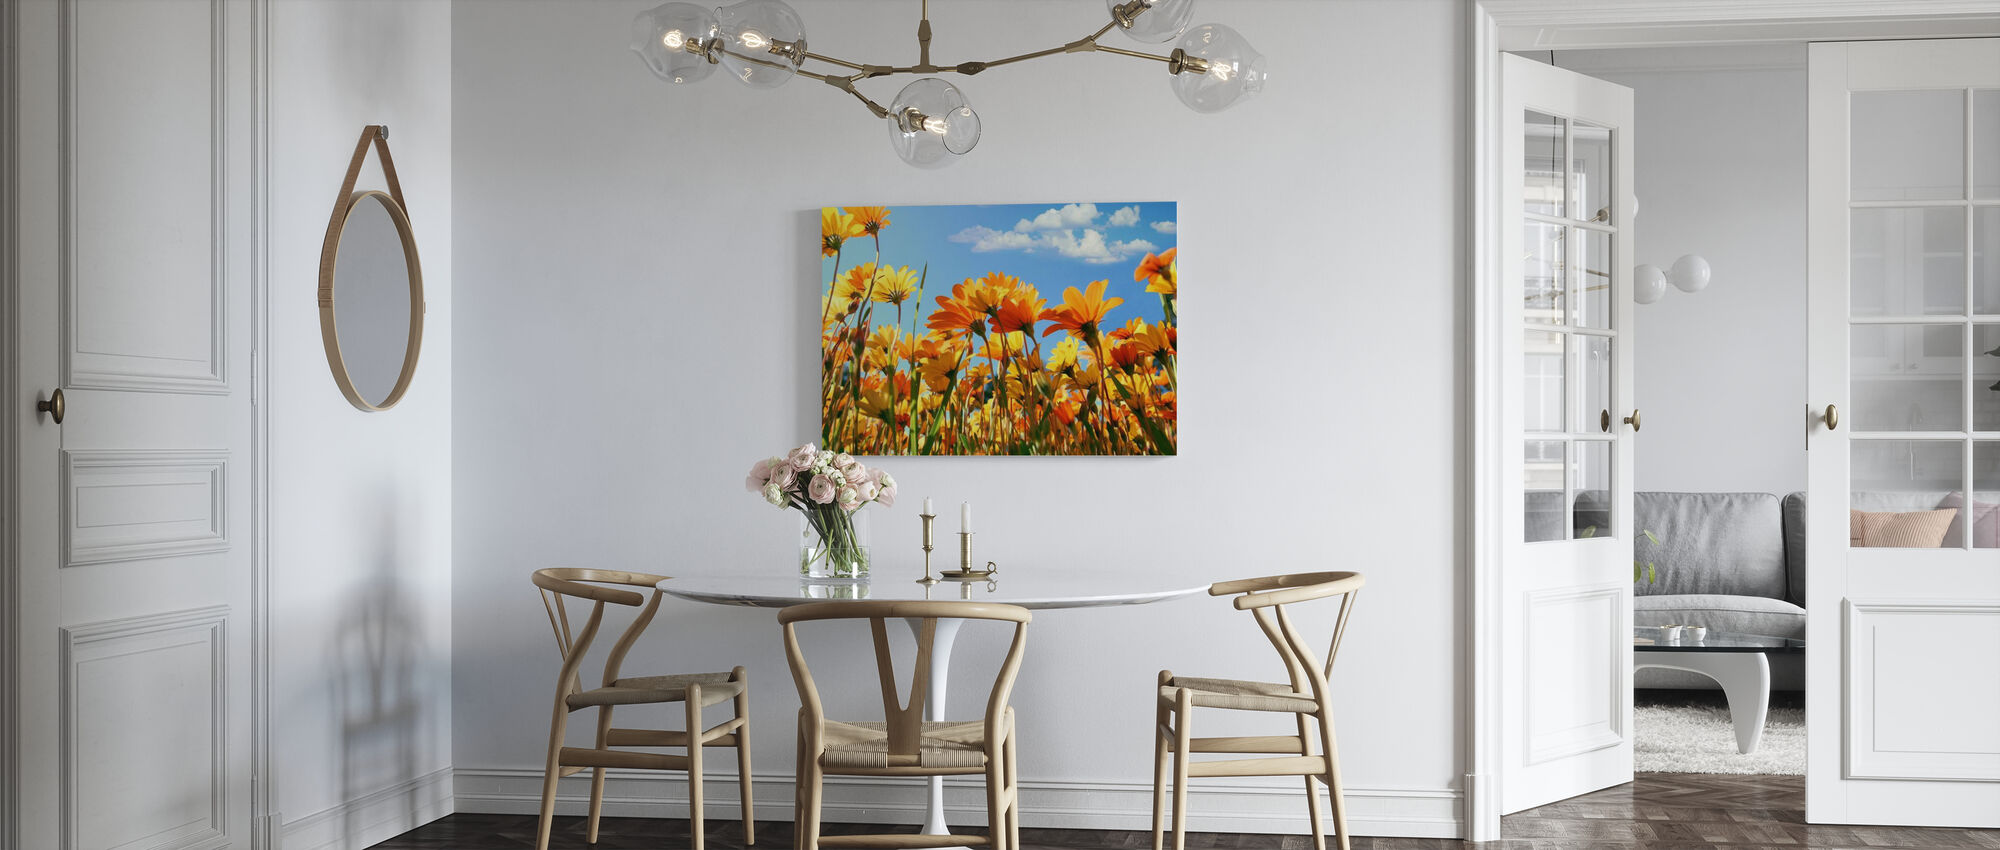 Lente oranje en gele wilde bloemen - Canvas print - Keuken